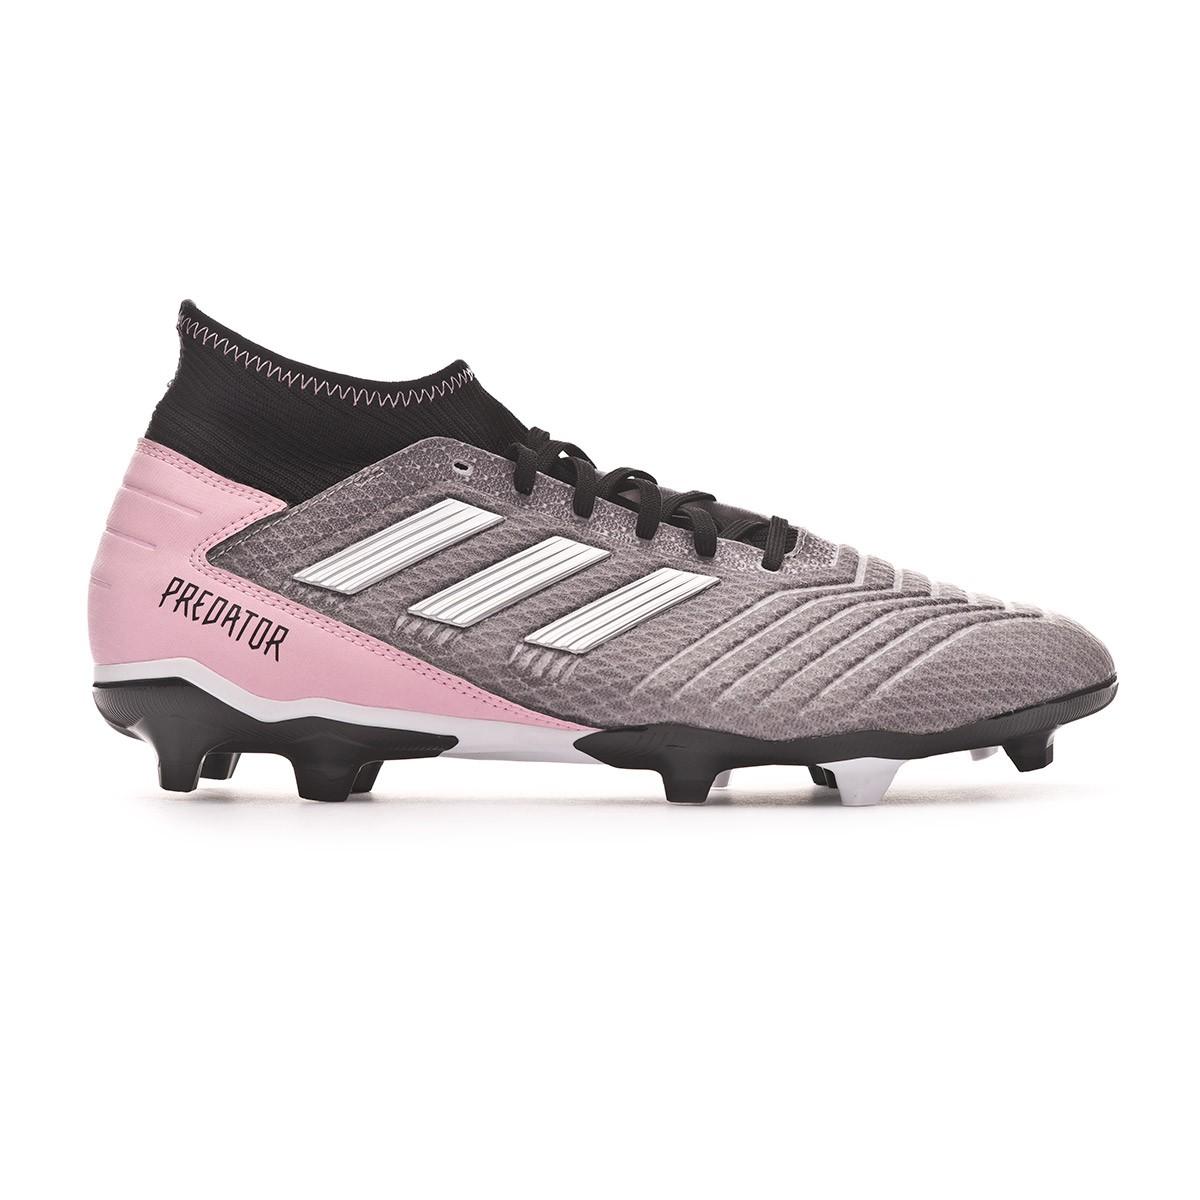 save off 4d5c5 a8472 Football Boots adidas Predator 19.3 FG Mujer Grey three-Silver  metallic-Core black - Tienda de fútbol Fútbol Emotion